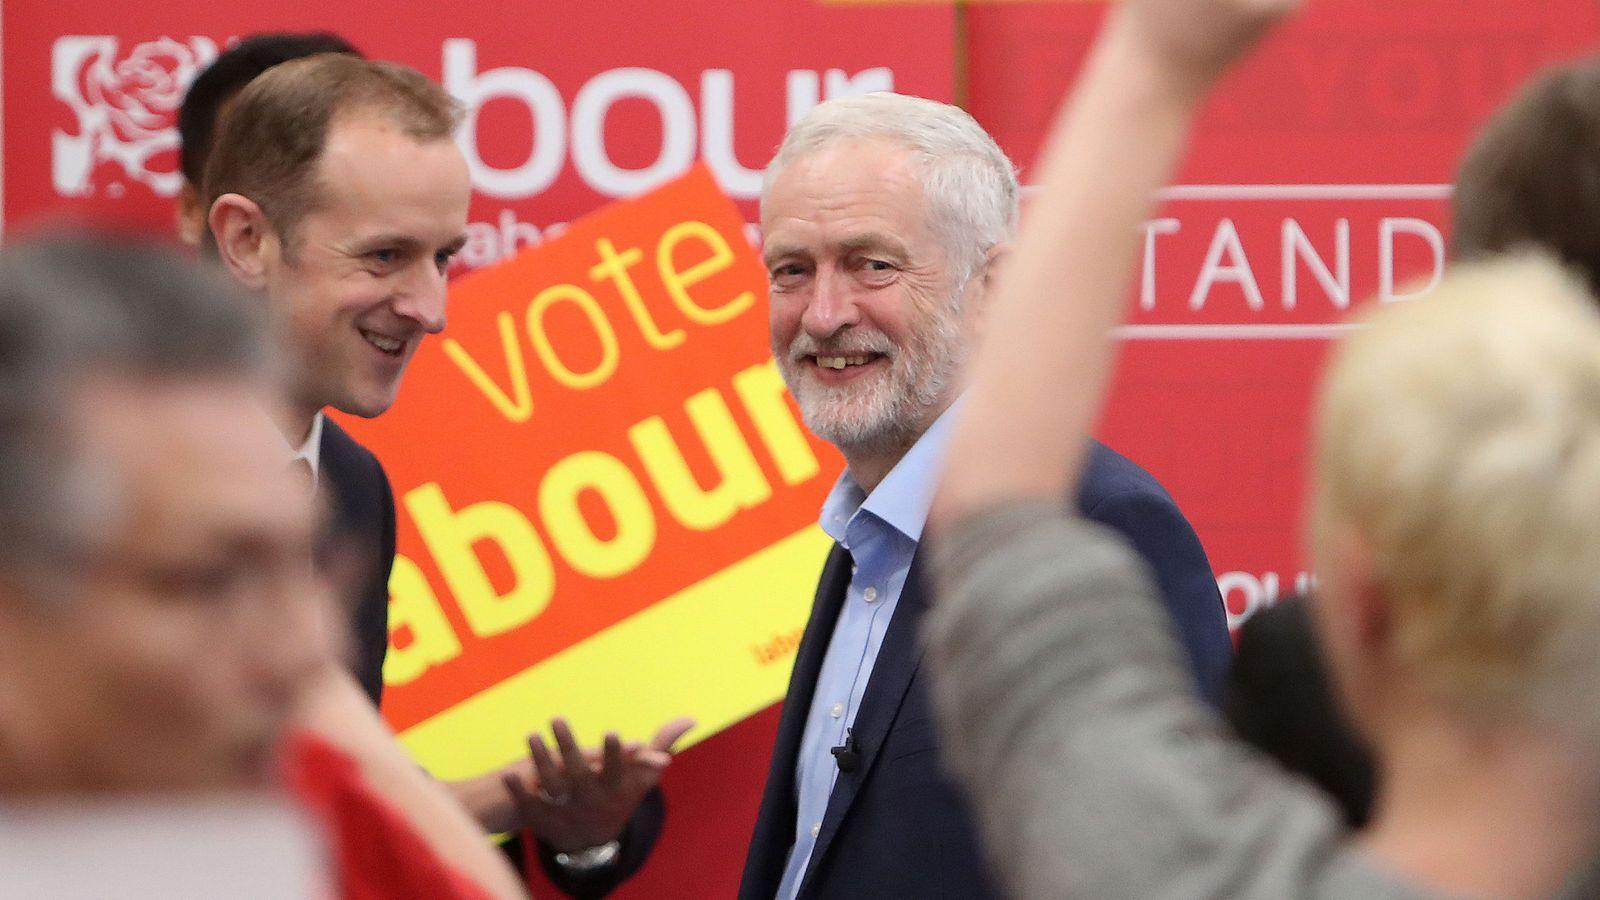 Jeremy Corbyn smiles after delivering a stump speech in Swindon